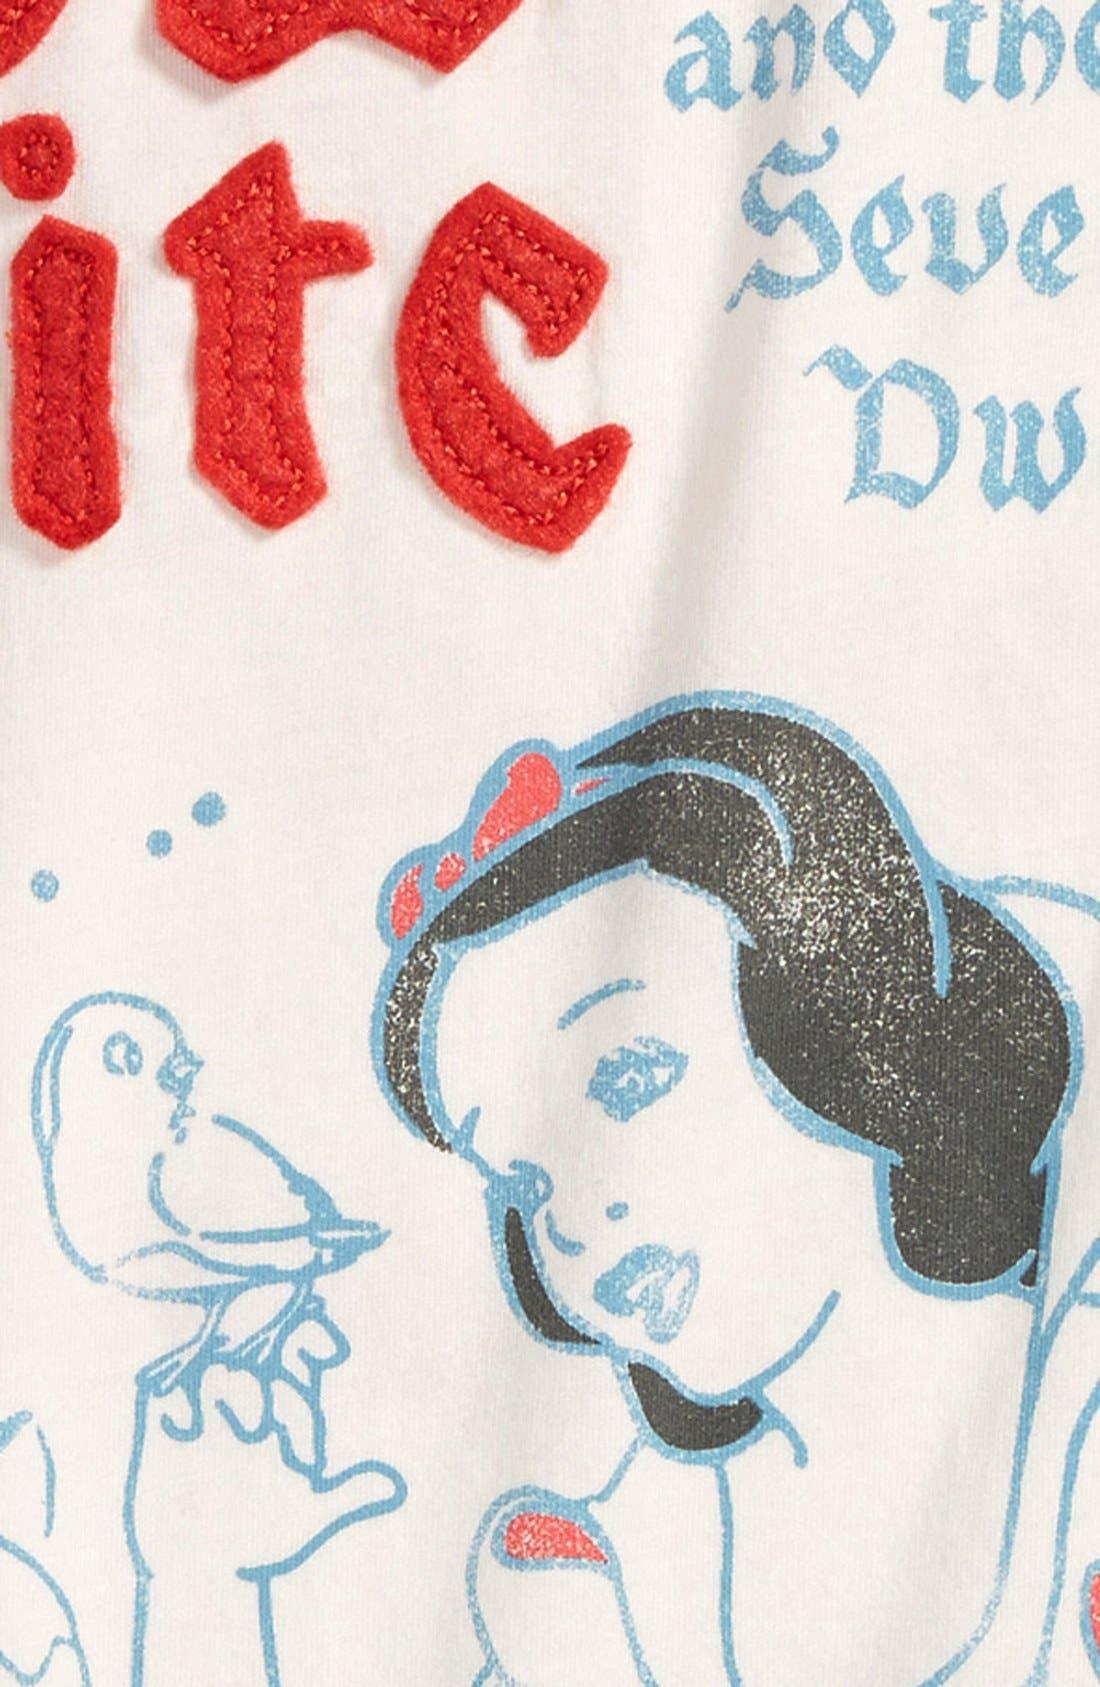 'Disney<sup>®</sup> - Snow White & the Seven Dwarves' Graphic Pima Cotton Tee,                             Alternate thumbnail 2, color,